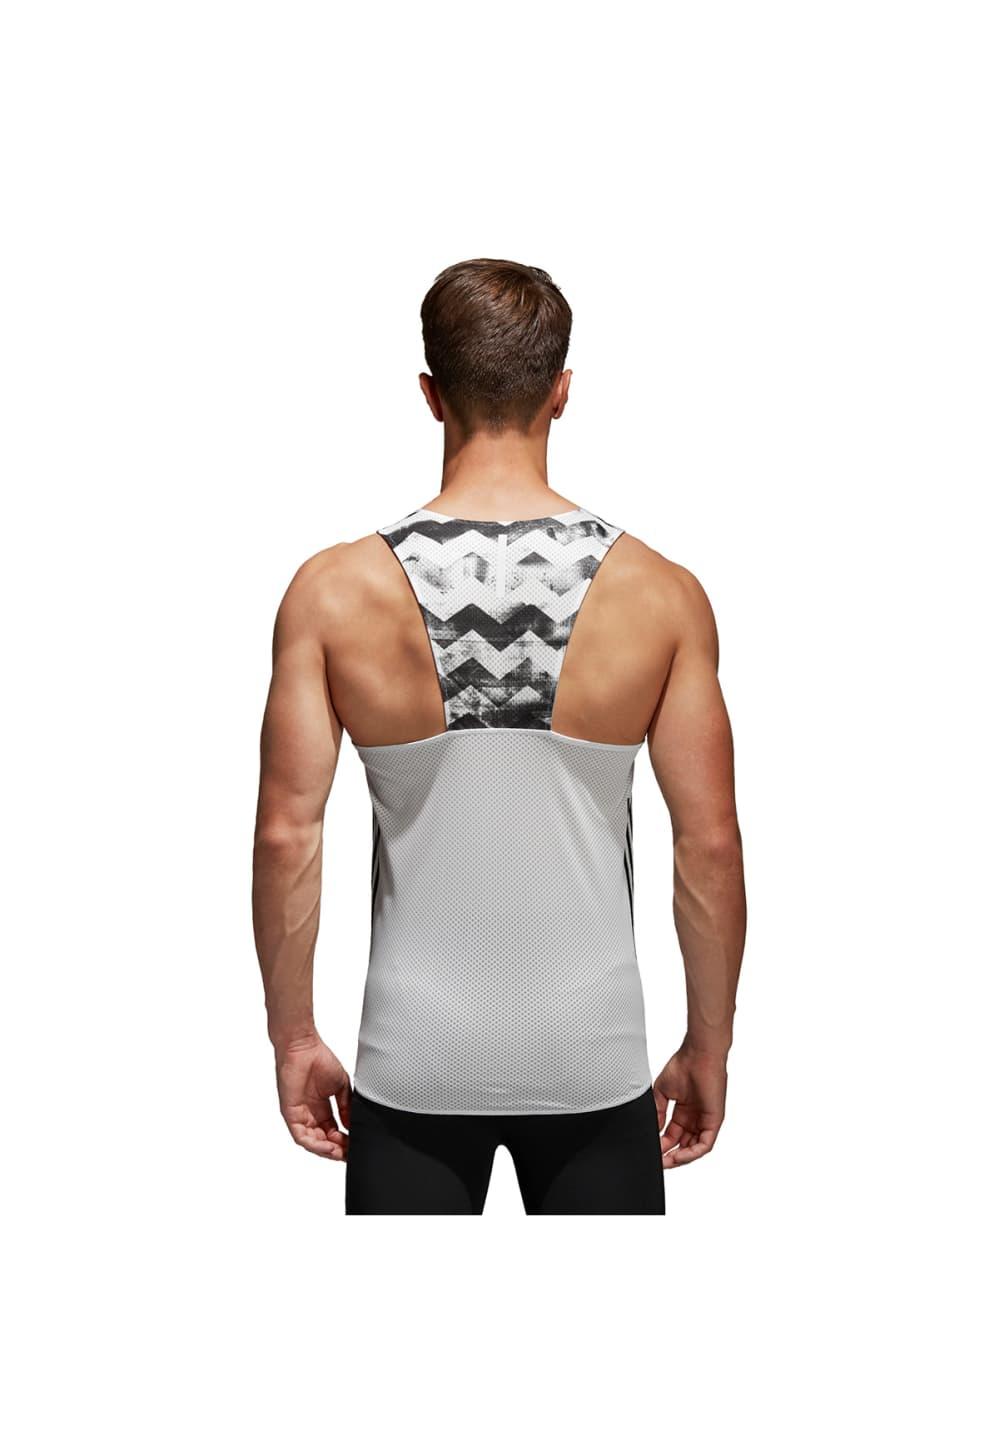 c1eae02c69f adidas Adizero Singlet Men - Running tops for Men - White | 21RUN